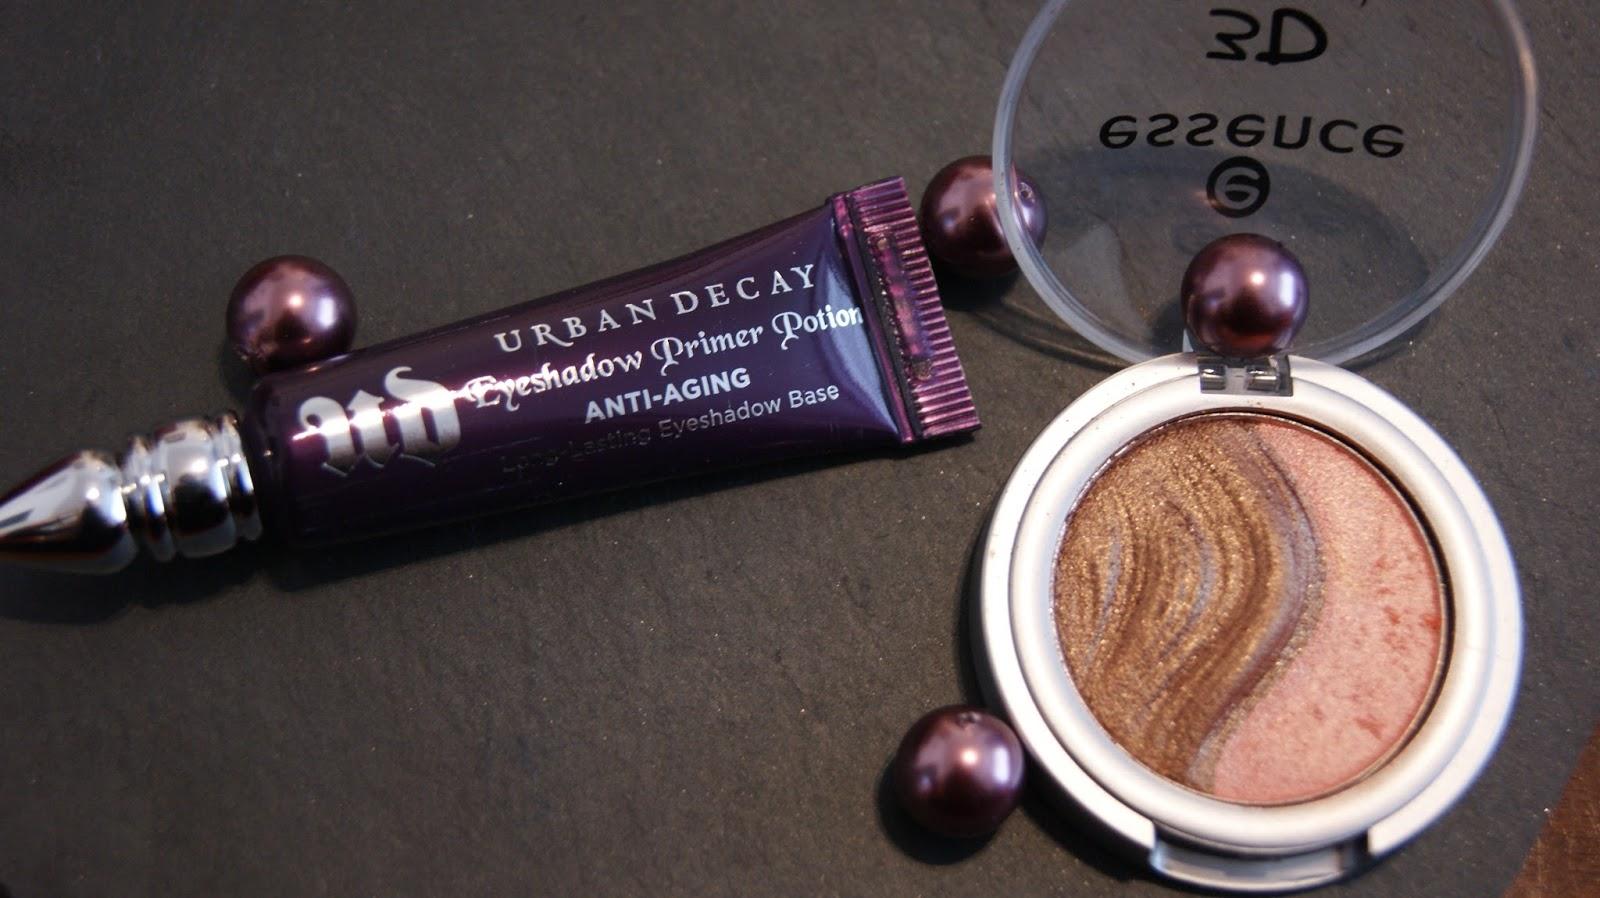 urban decay primer potion tube with eyeshadow